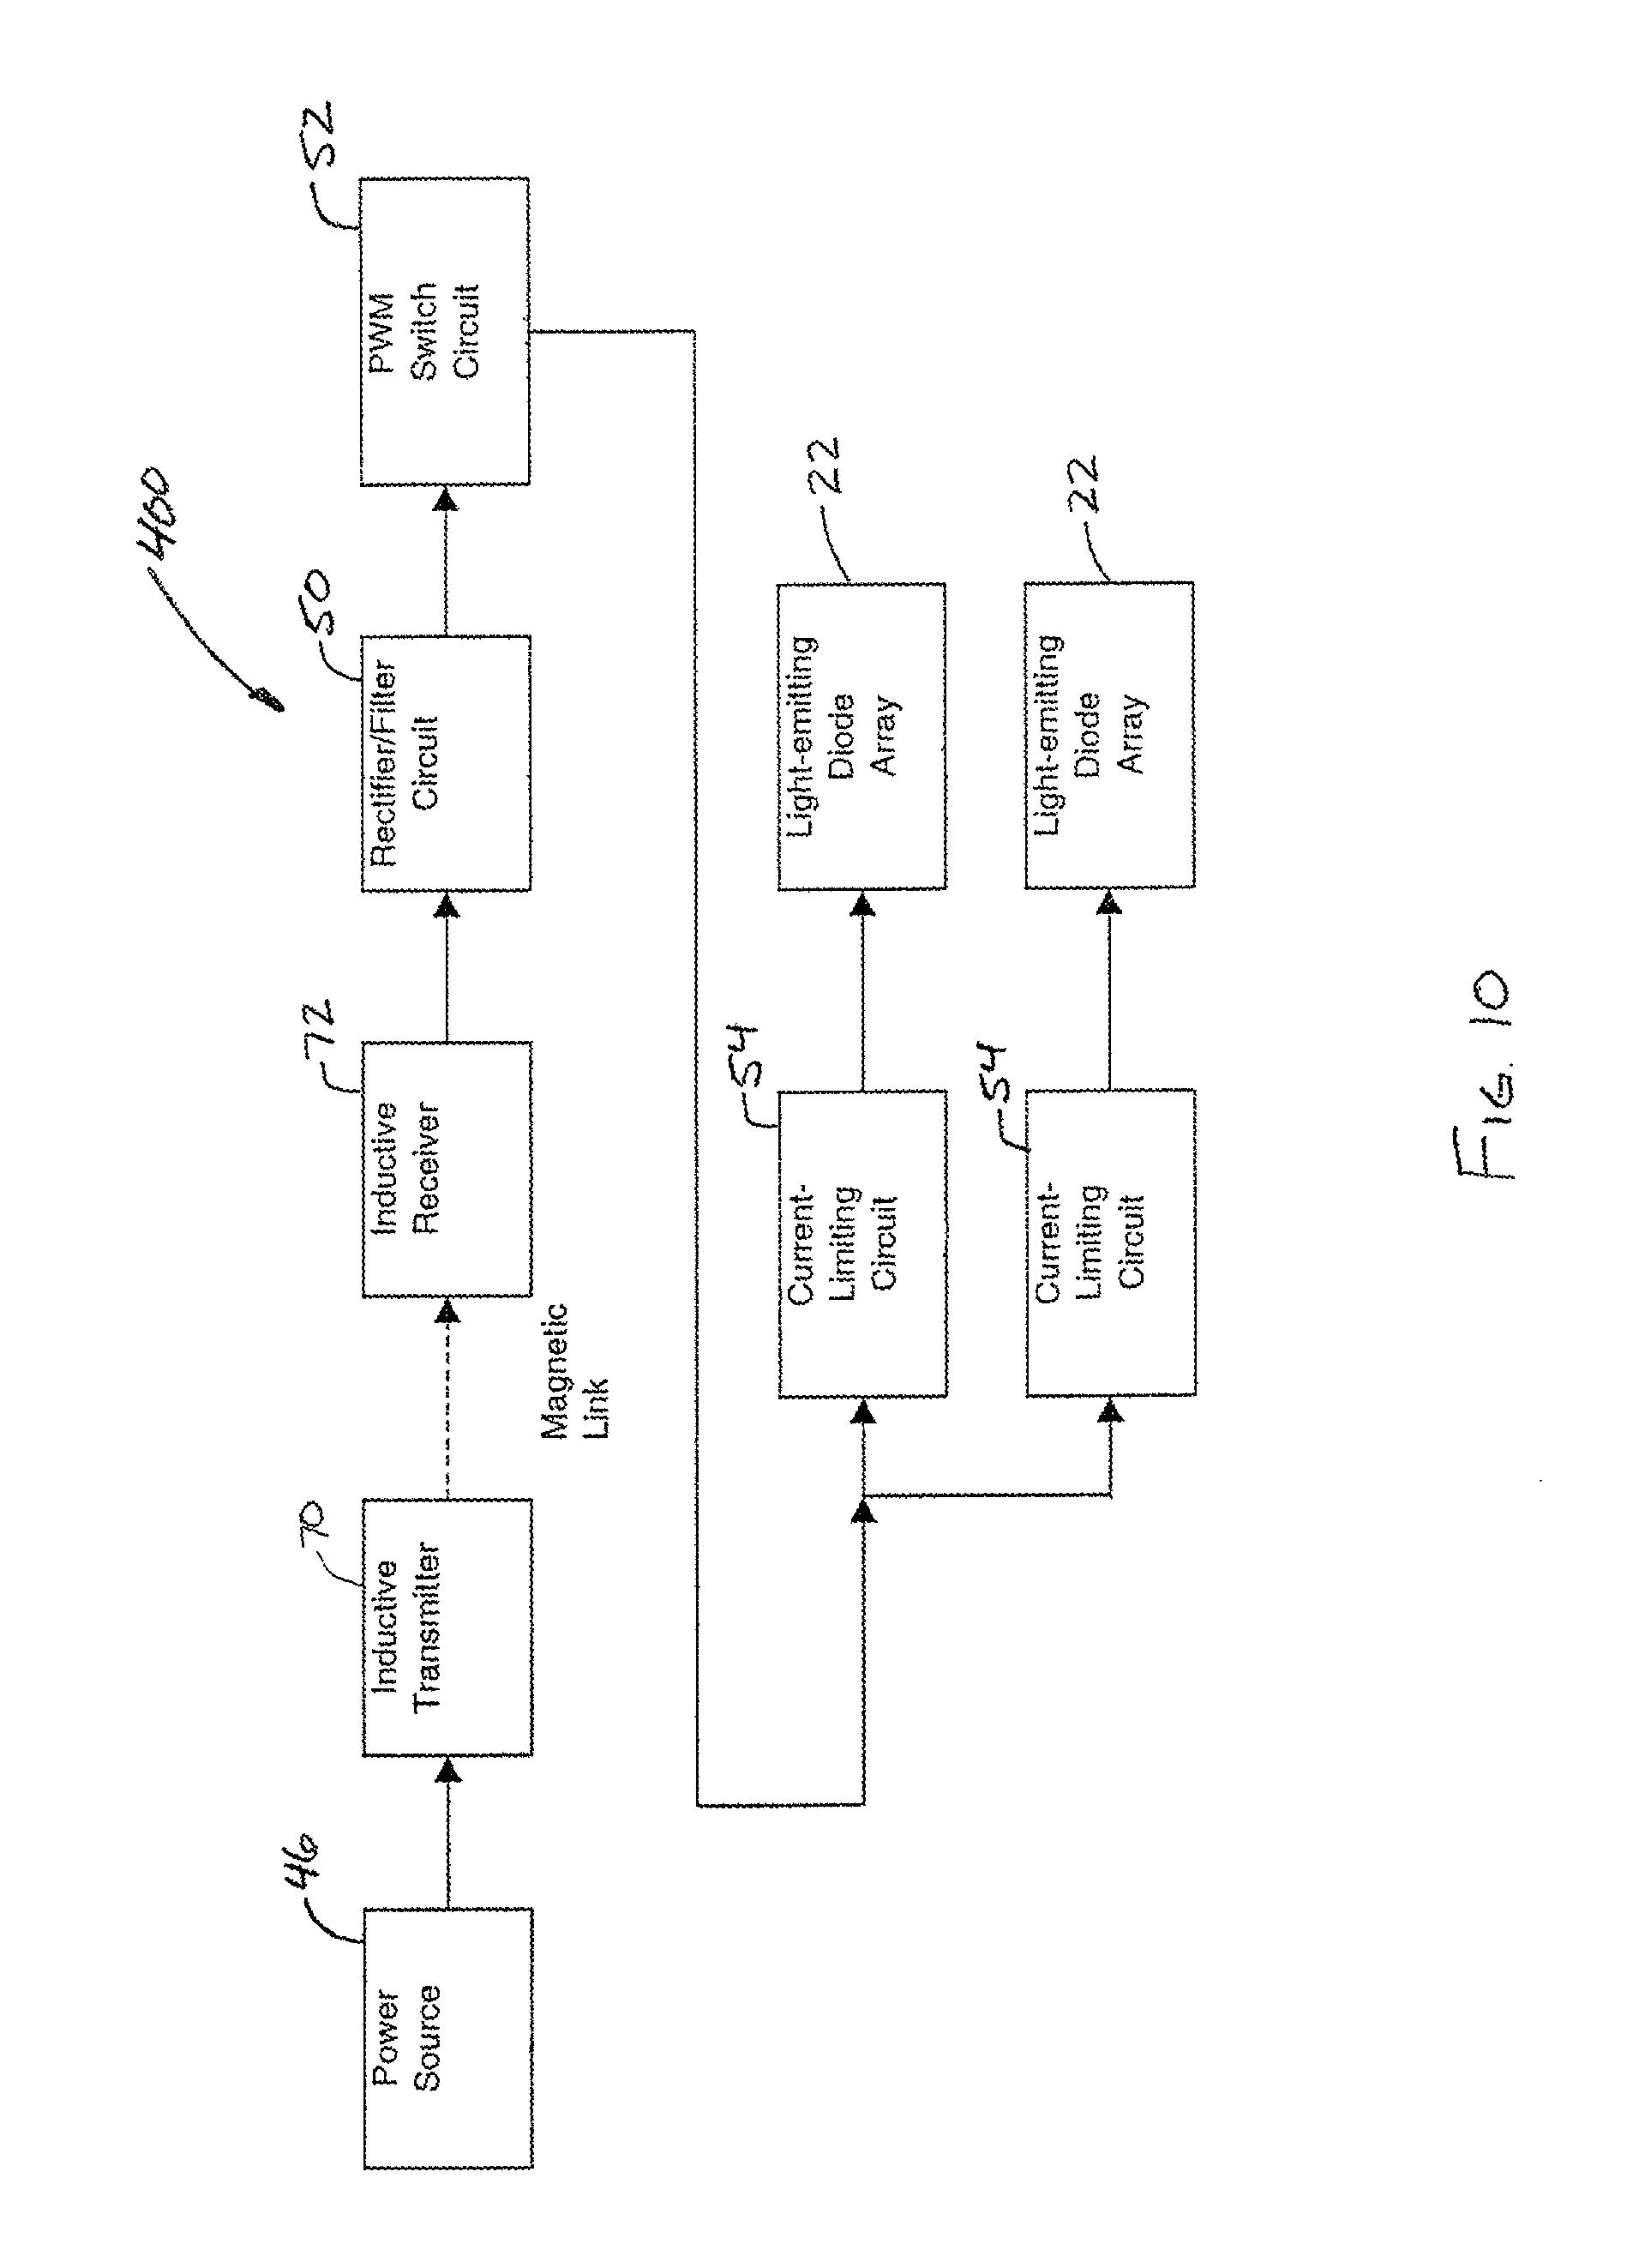 Patent US 9,803,806 B2 on